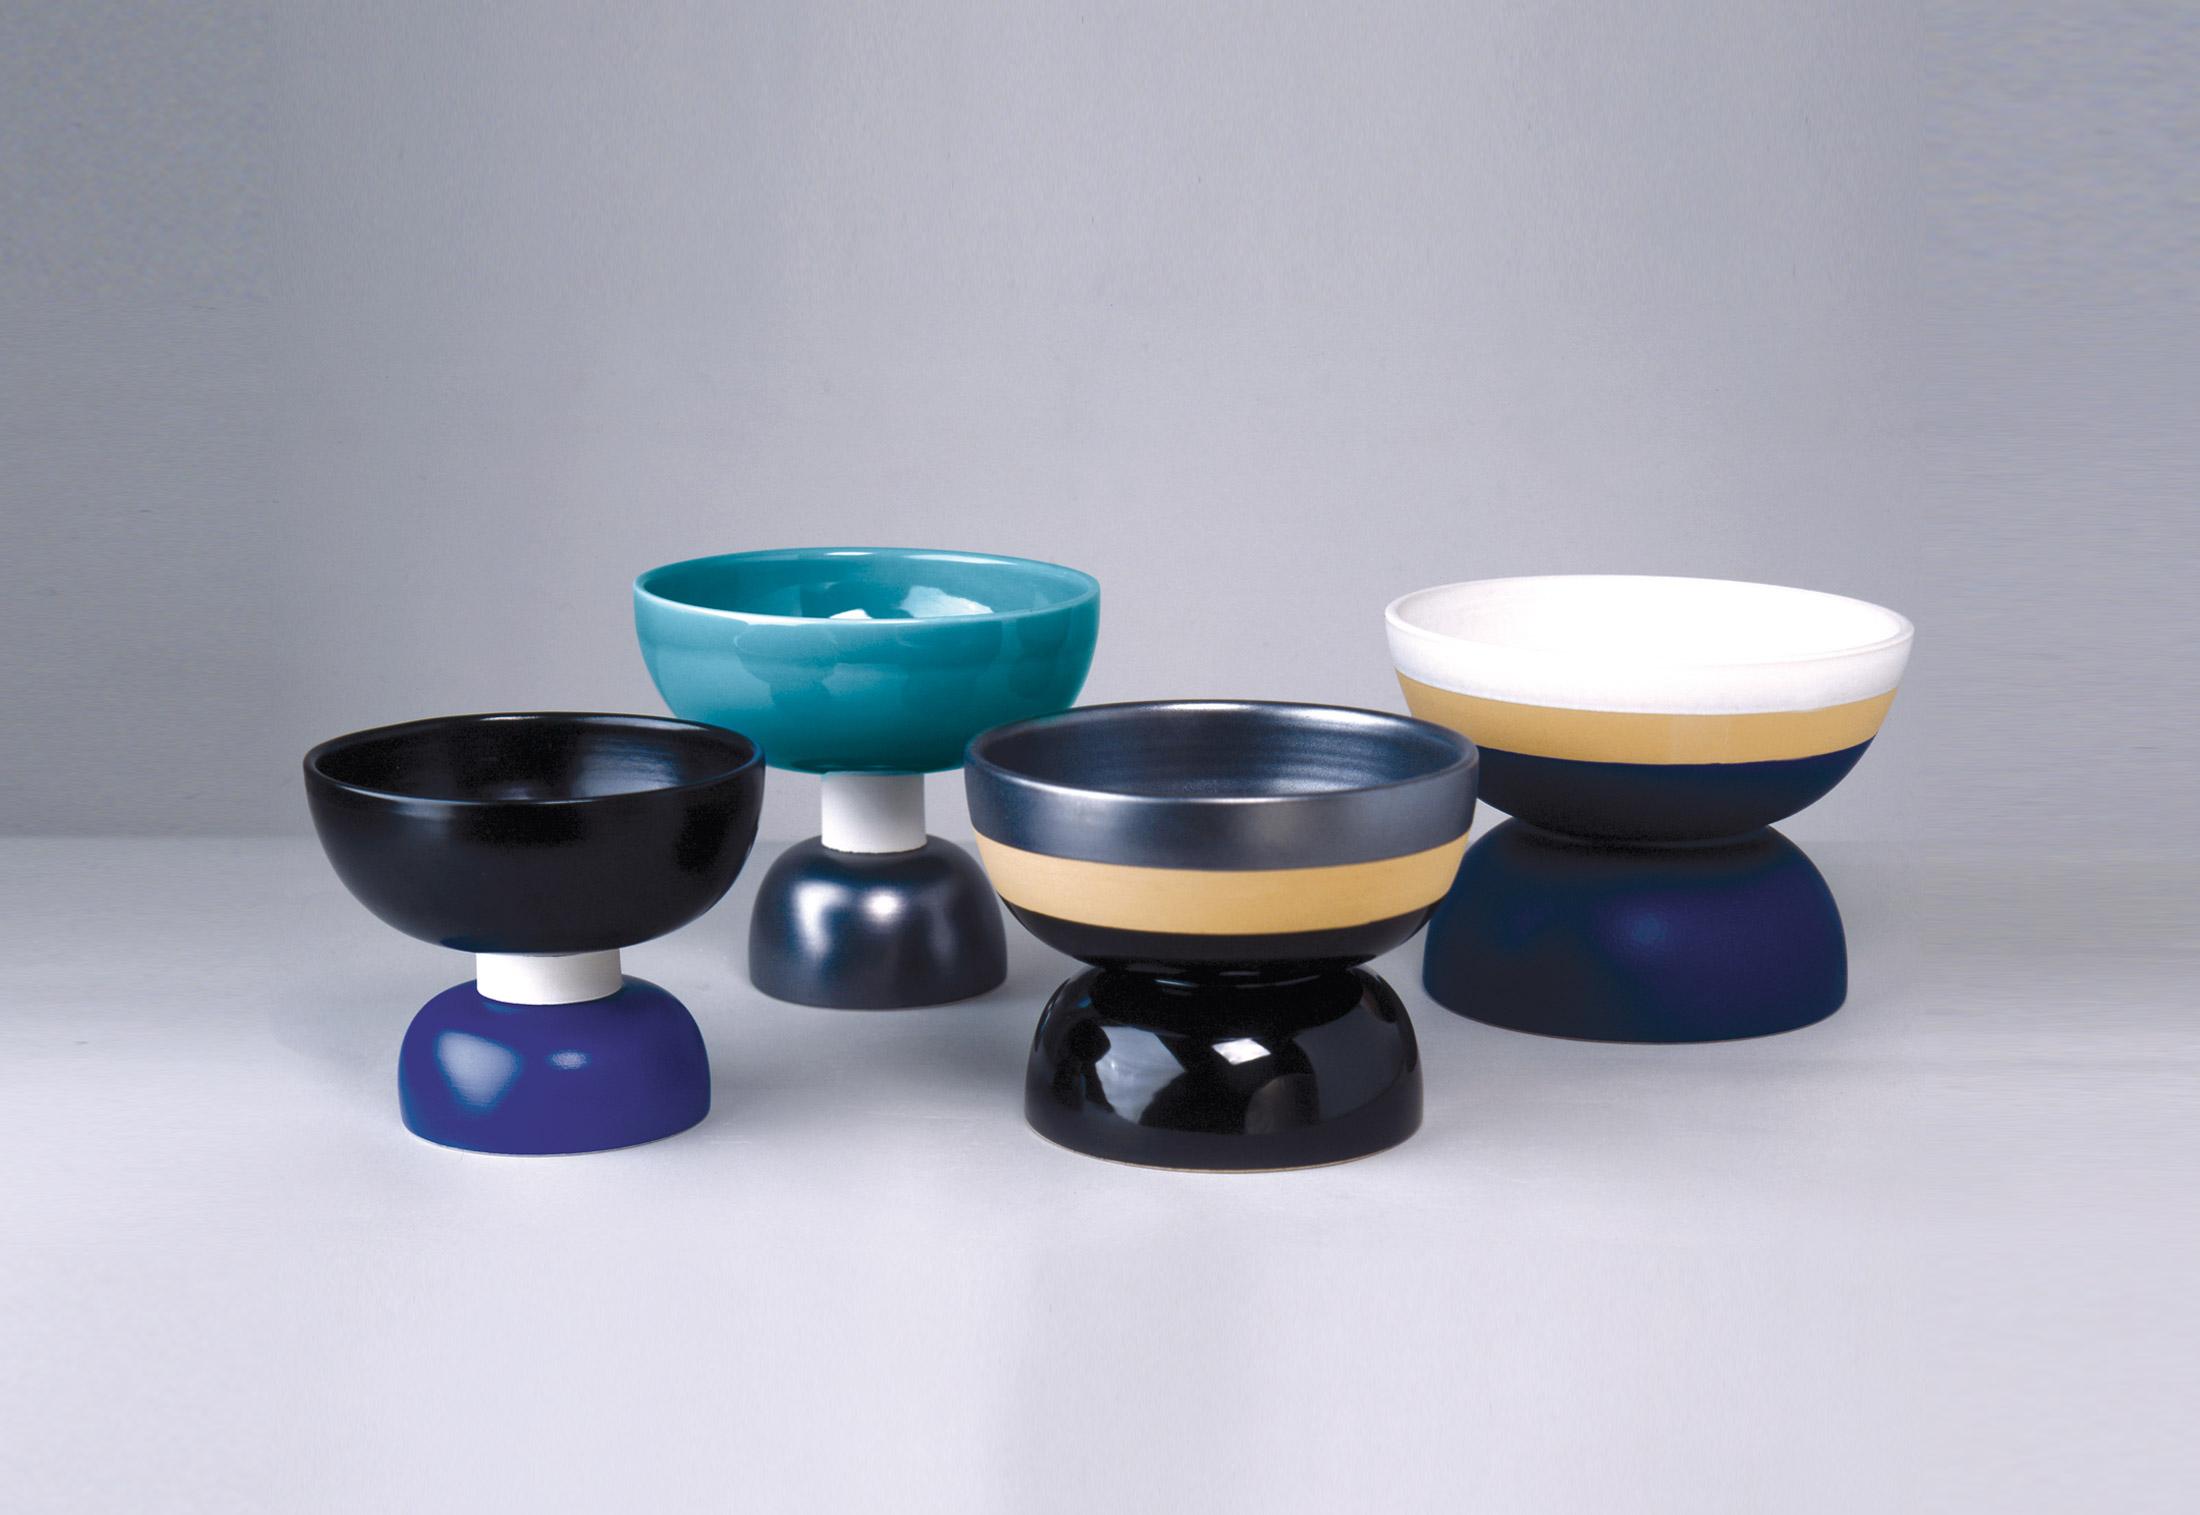 Two-Toned Matt Blue Bowl - Bowl Hand-turned in white clay. Two-tone matt blue and black glaze. | Matter of Stuff